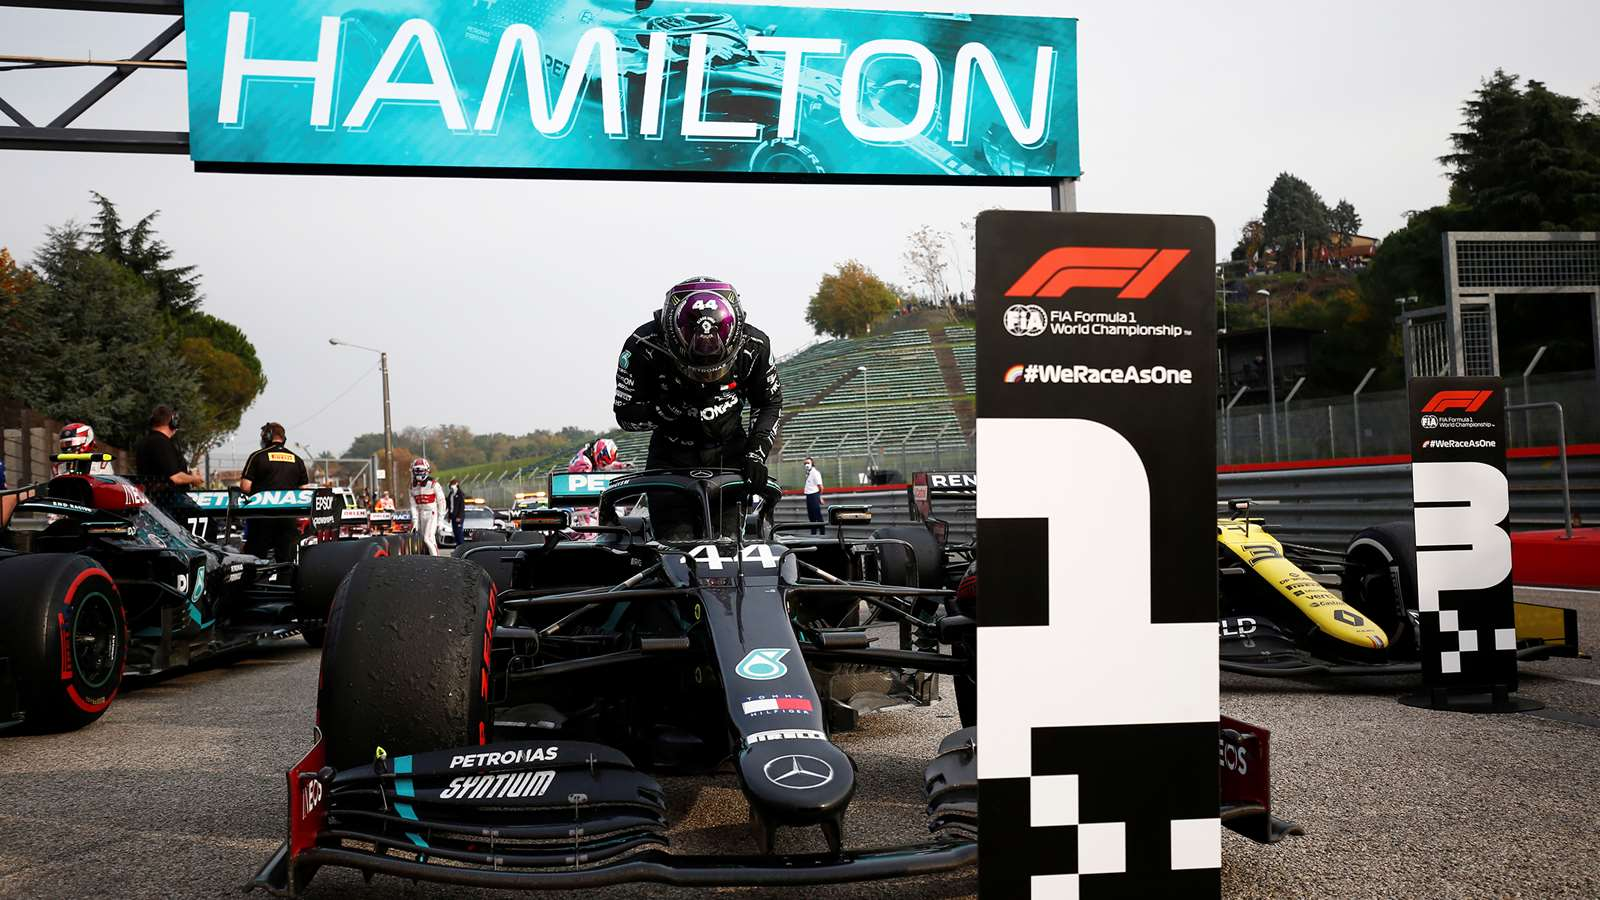 F1 Emilia Romanga Grand Prix Imola – Lewis Hamilton Mercedes